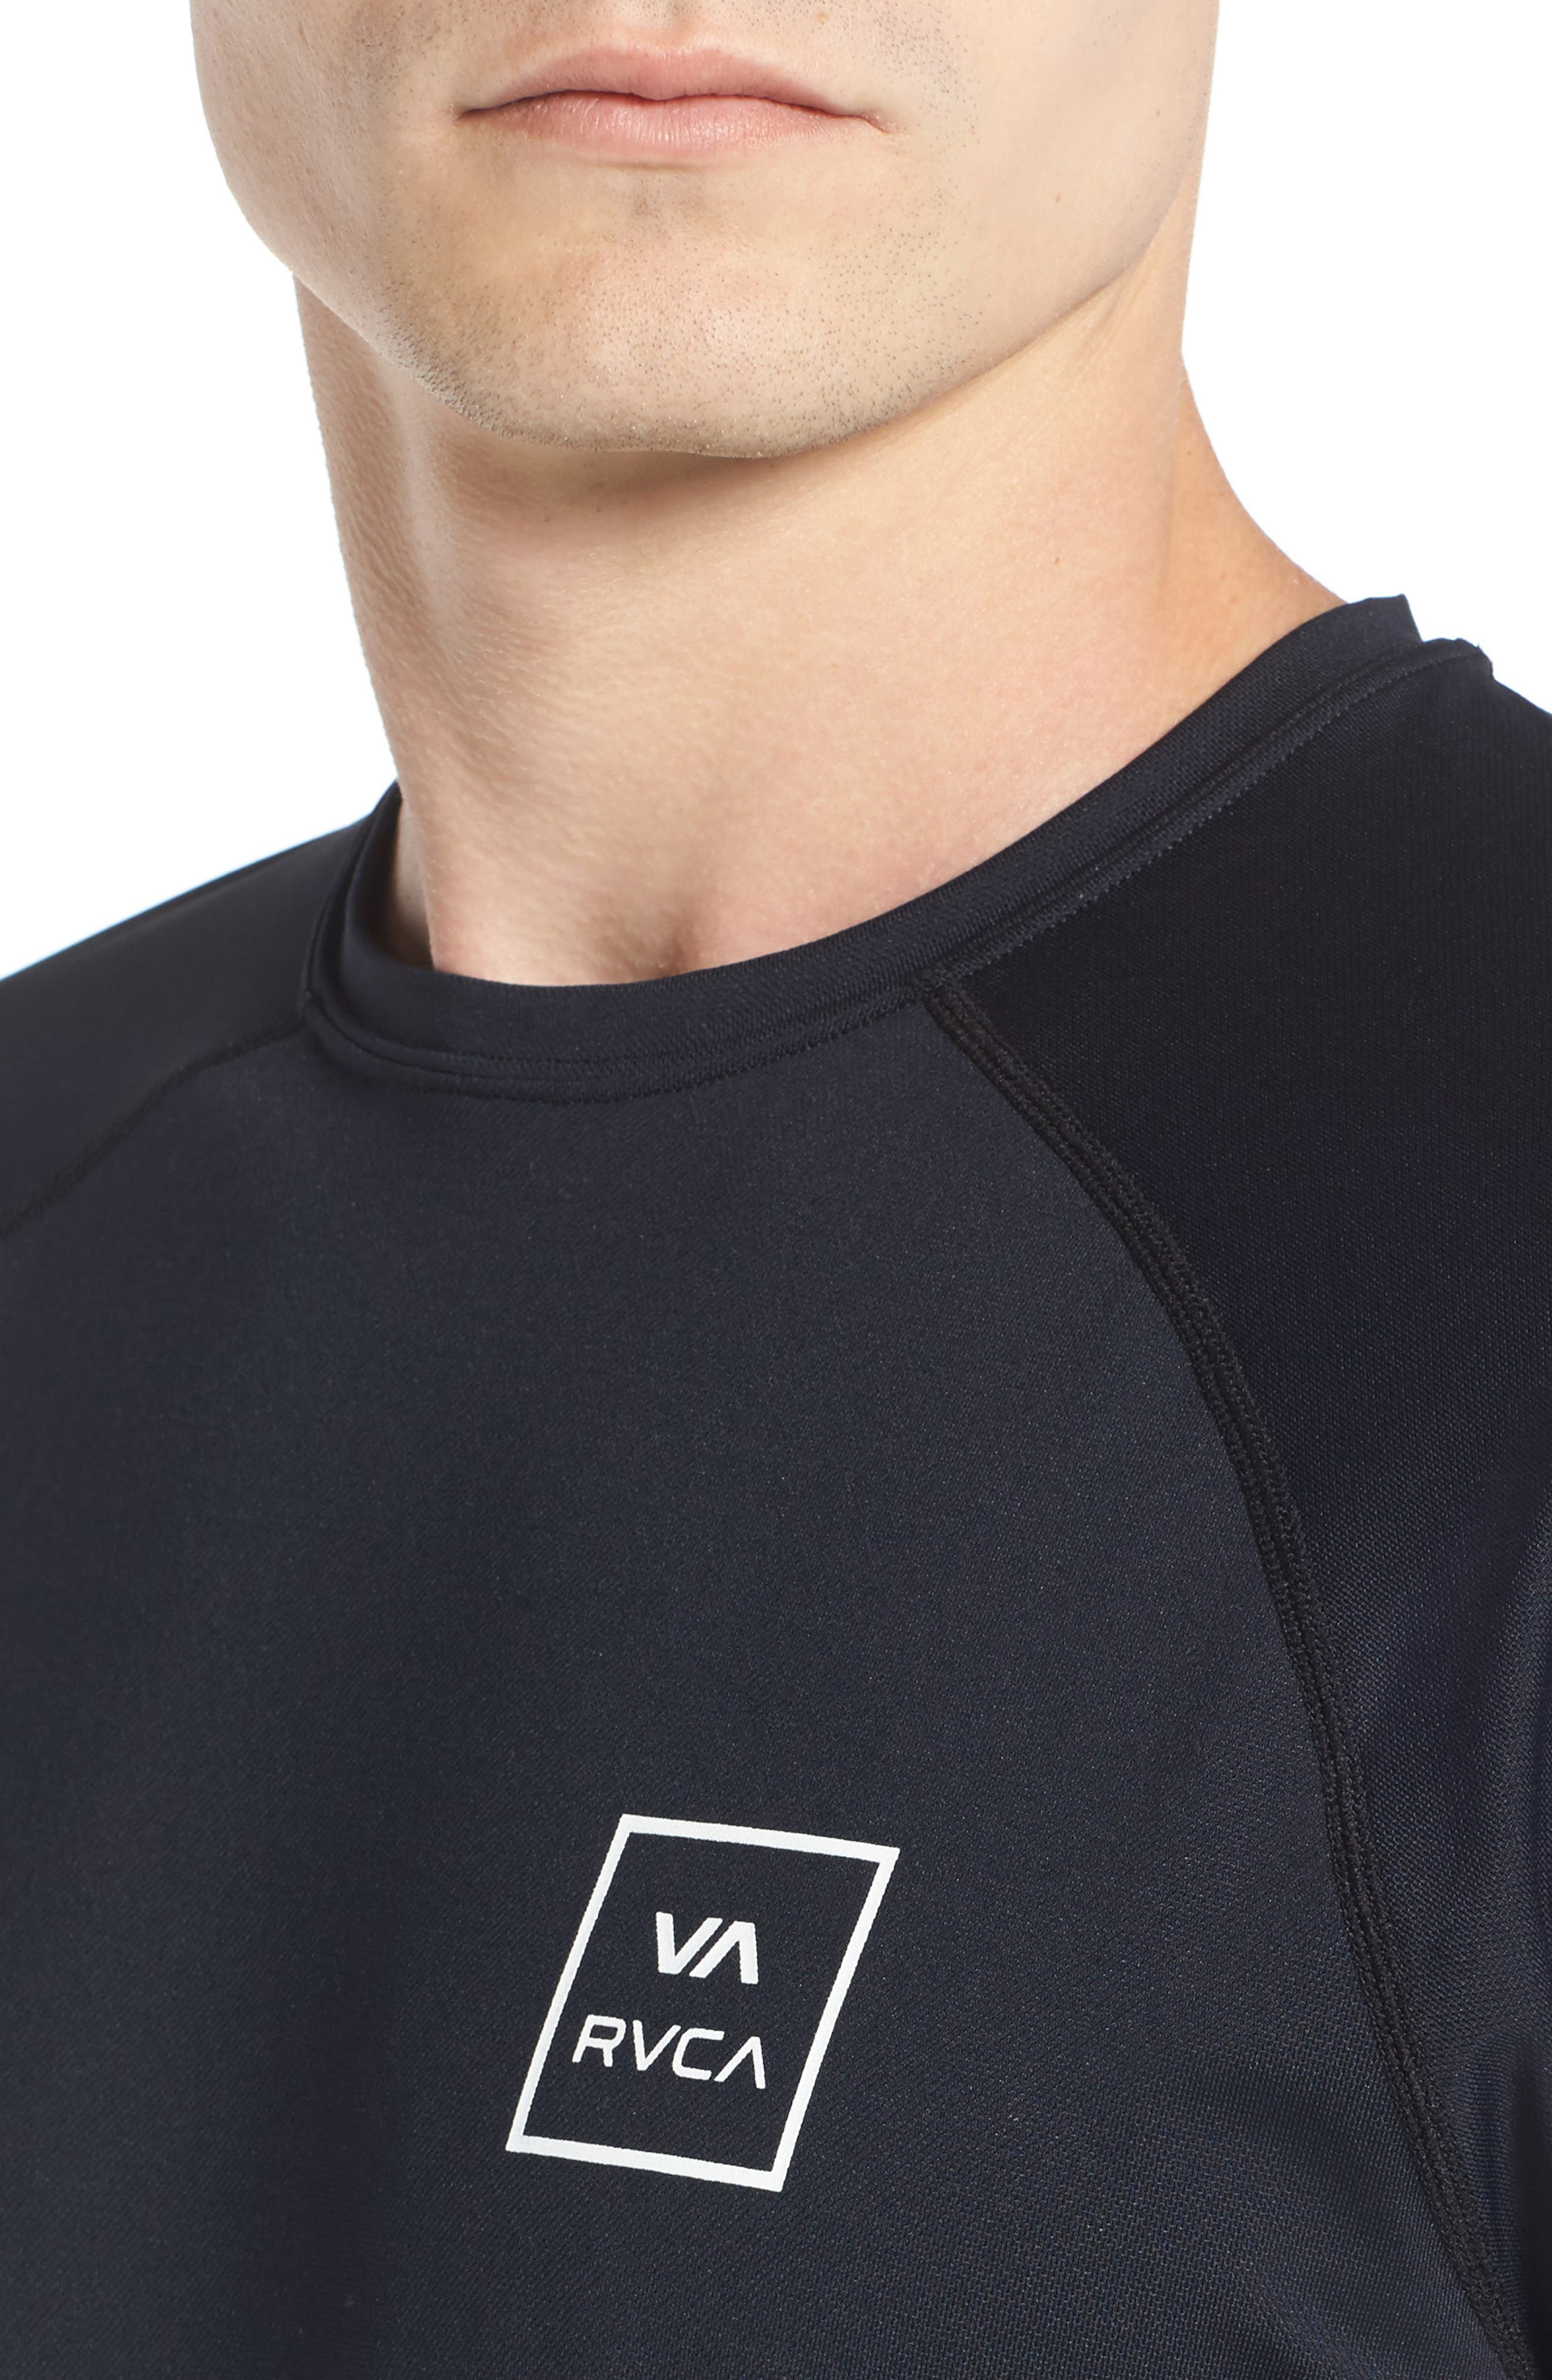 VA All the Way Surf T-Shirt,                             Alternate thumbnail 4, color,                             001